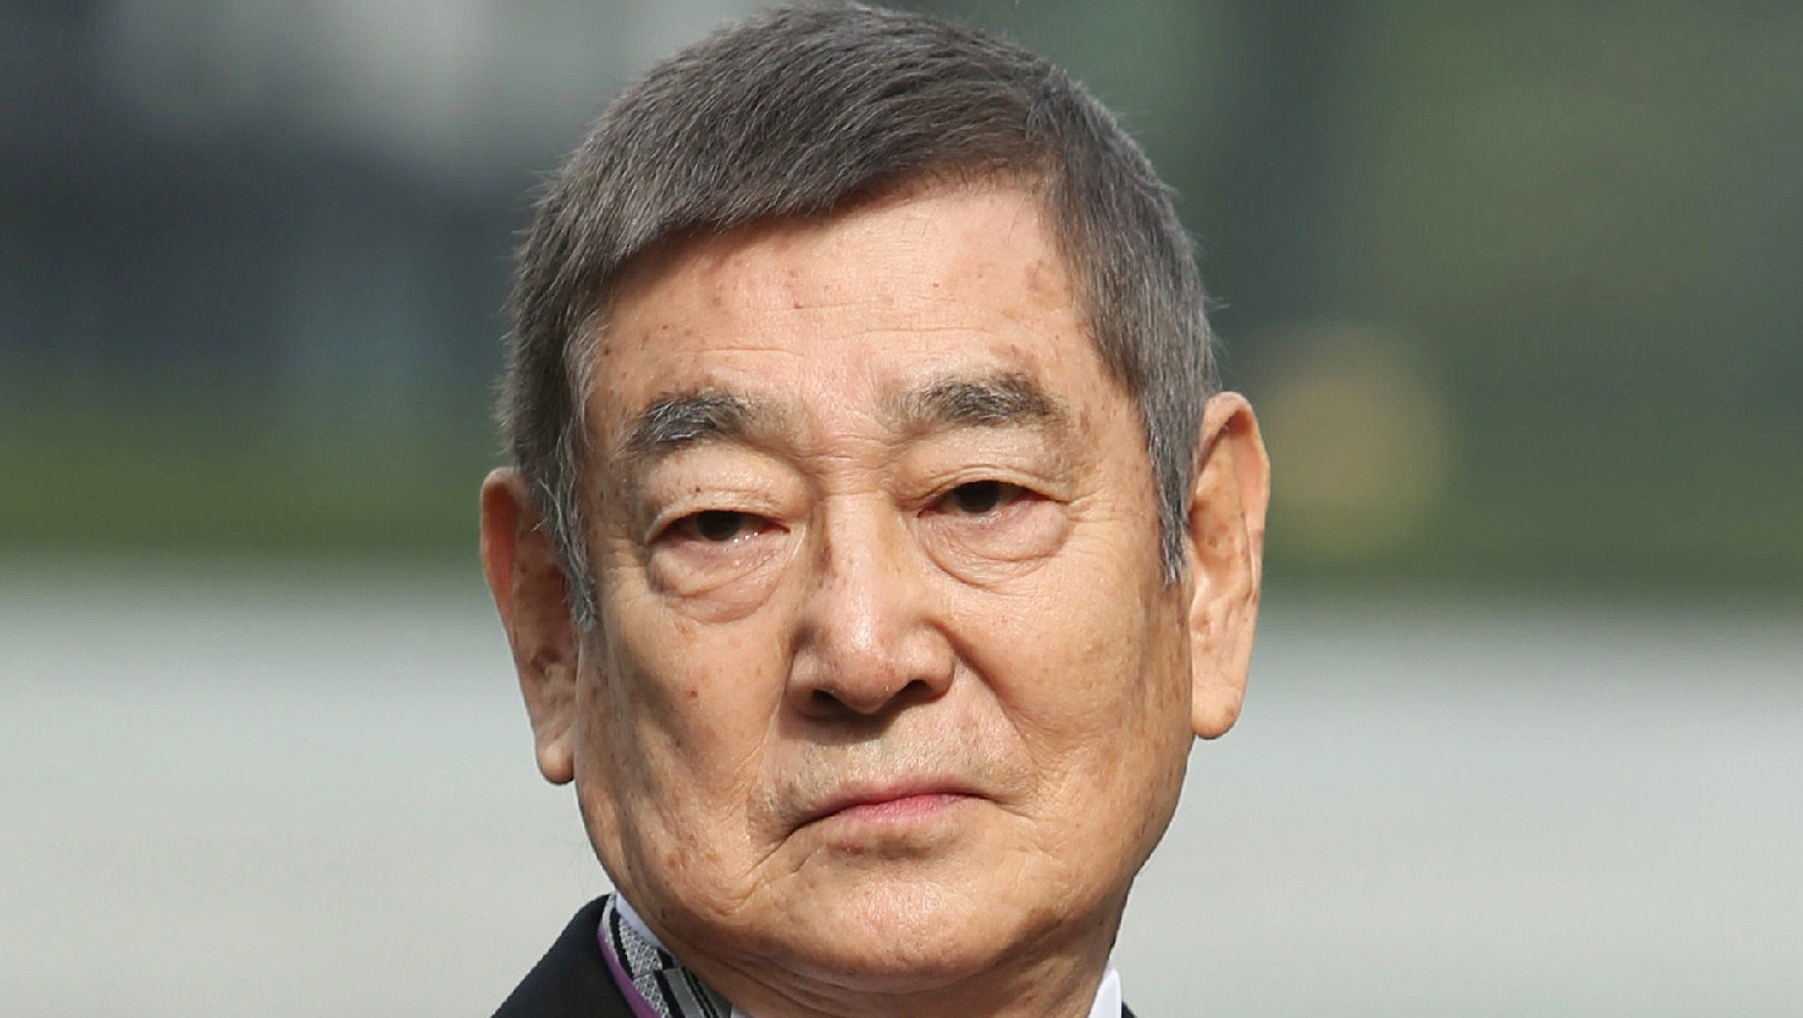 Ken Takakura, veteran Japanese actor, dies - CBS News